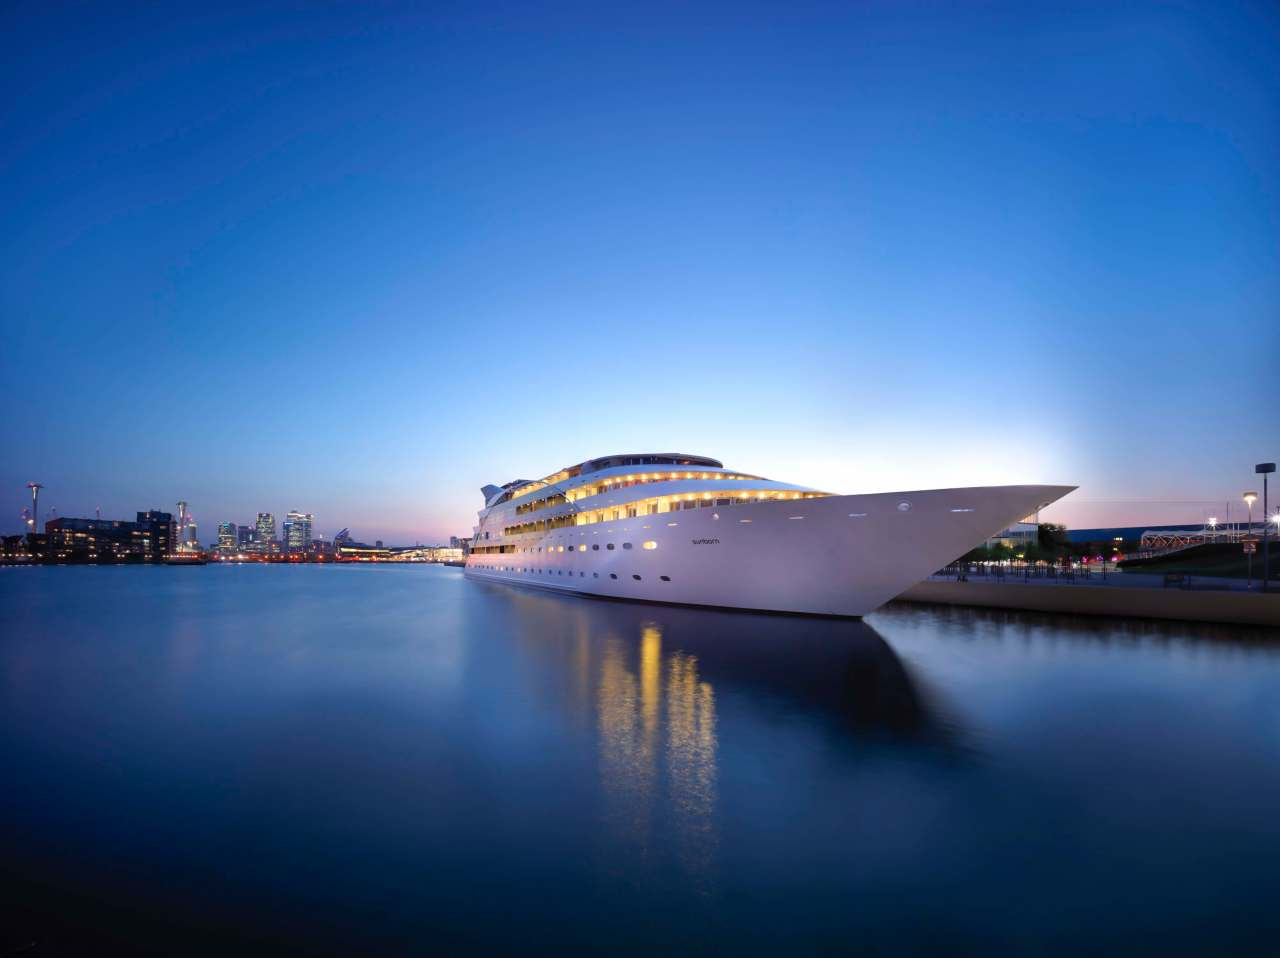 Superyacht hotel still open for lockdownworkers